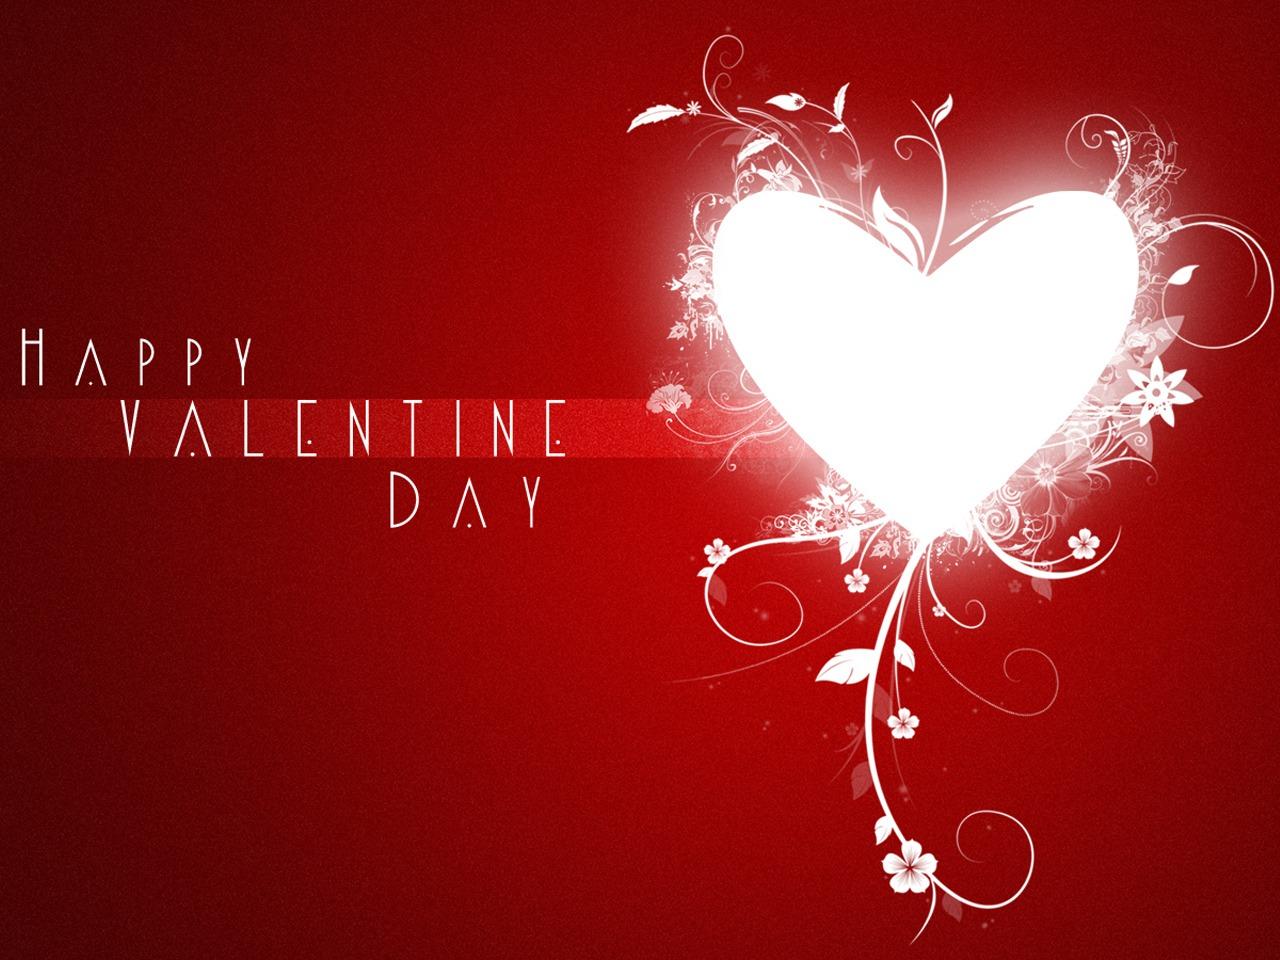 http://2.bp.blogspot.com/-Dpv32hiIyUk/TaMkI5SFT2I/AAAAAAAACbo/rmt0oSrKSwo/s1600/Valentine-Wallpapers-For-Facebook.jpg